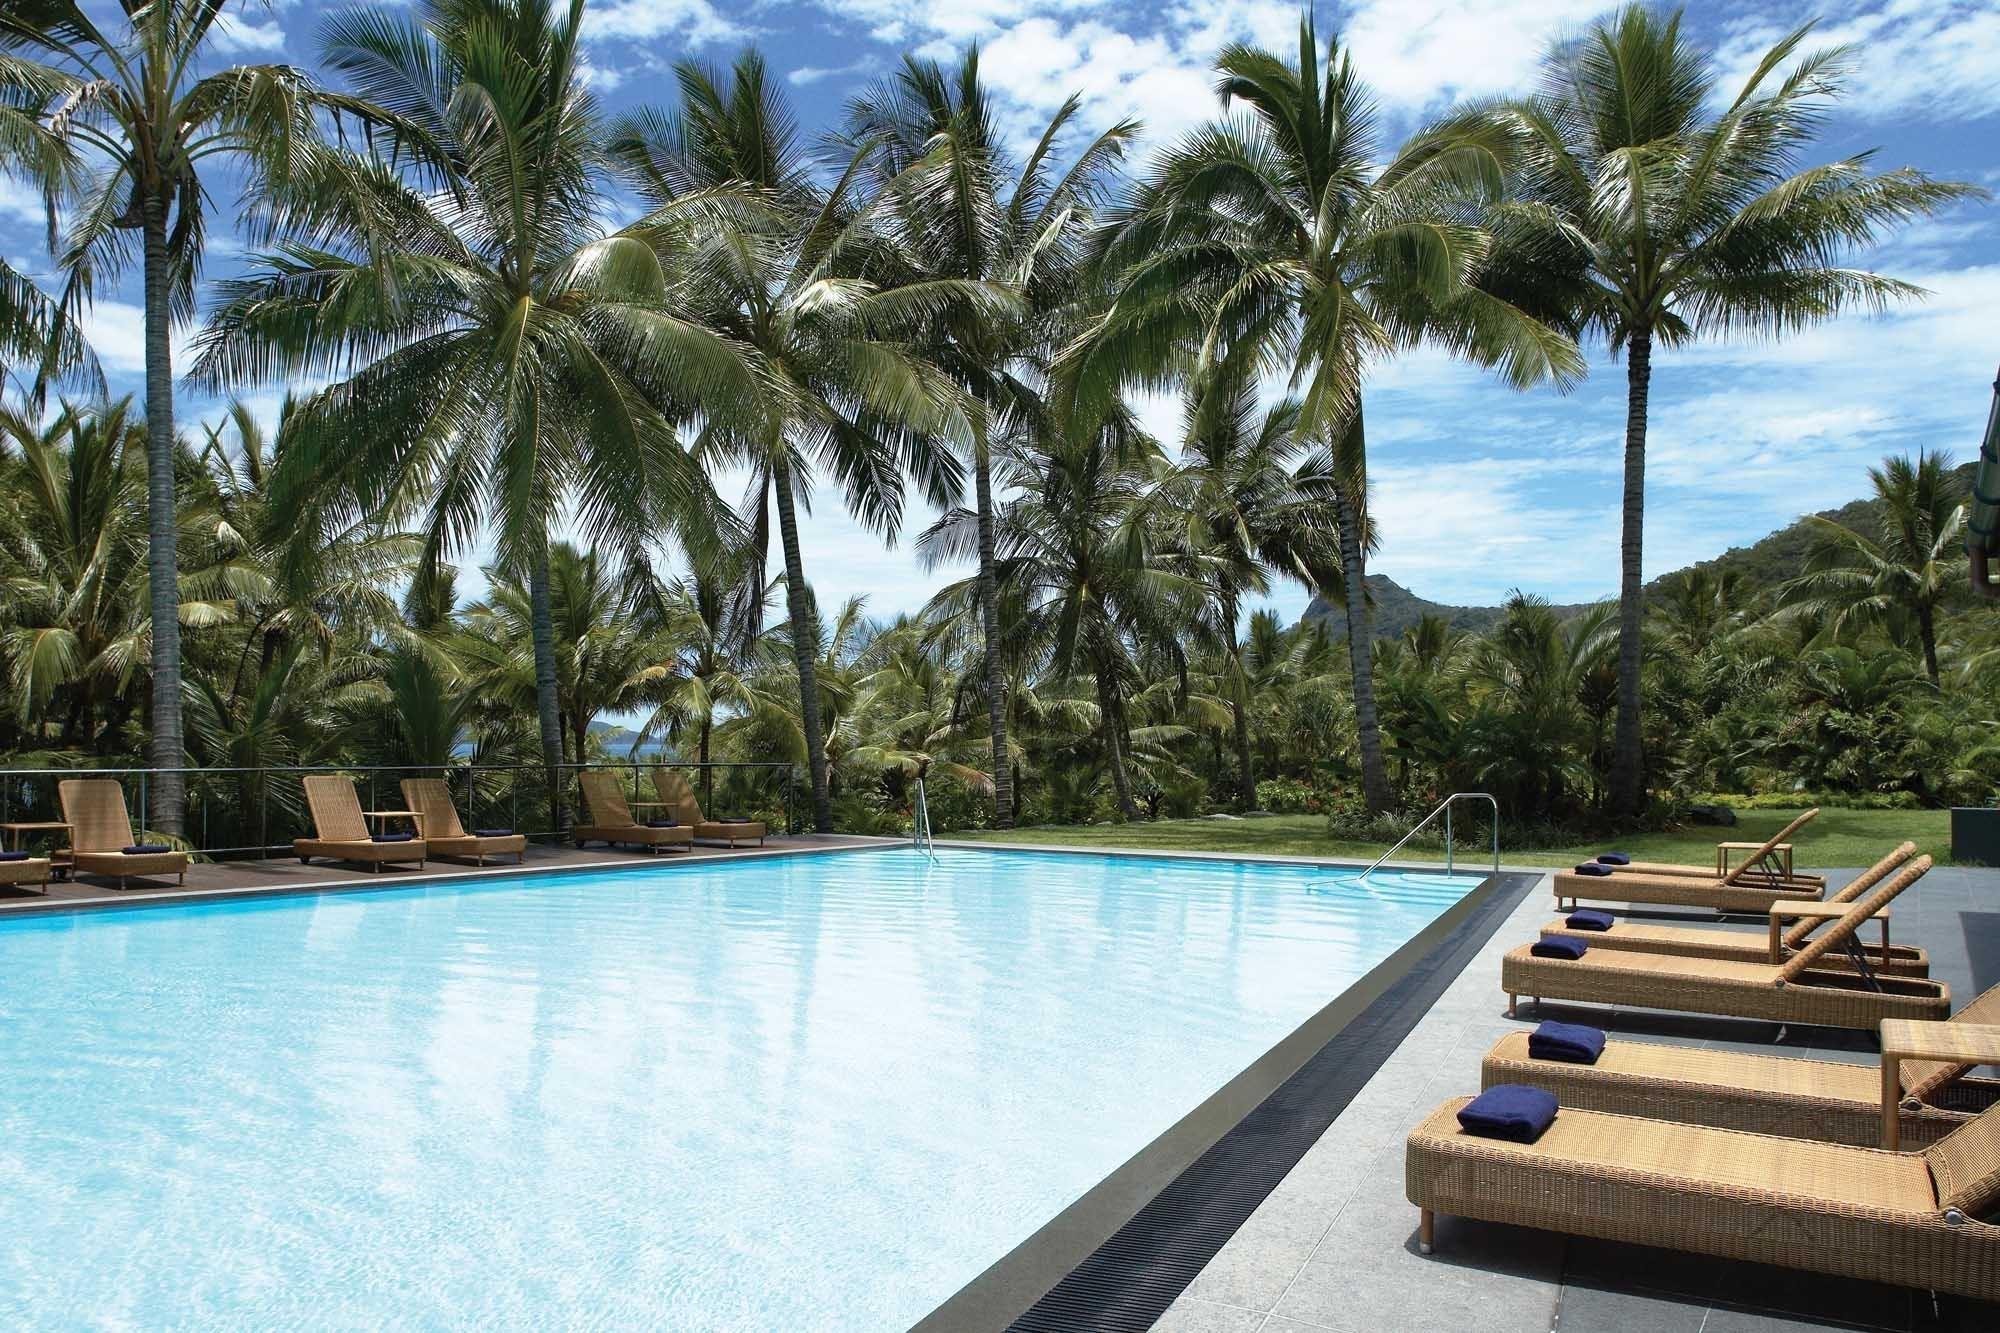 Reef View Hotel Lap Swimming Pool Hamilton Island Activities